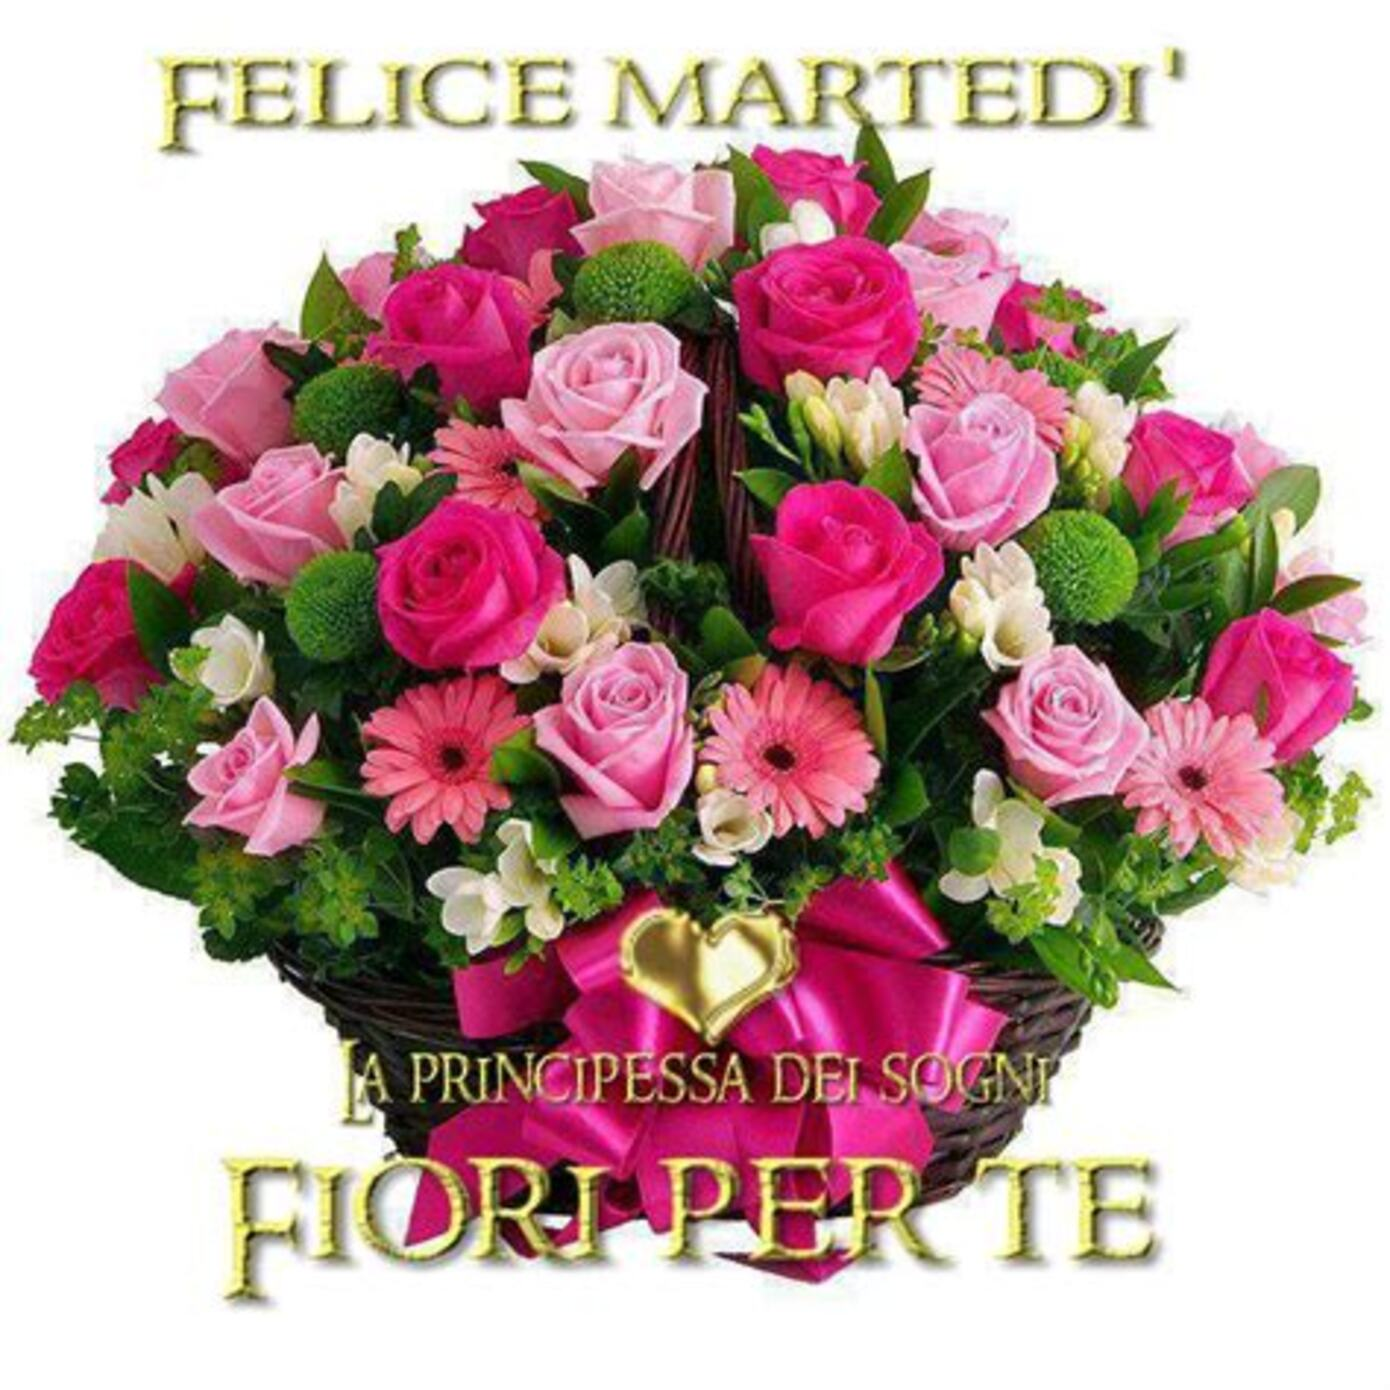 Felice Martedì fiori per te